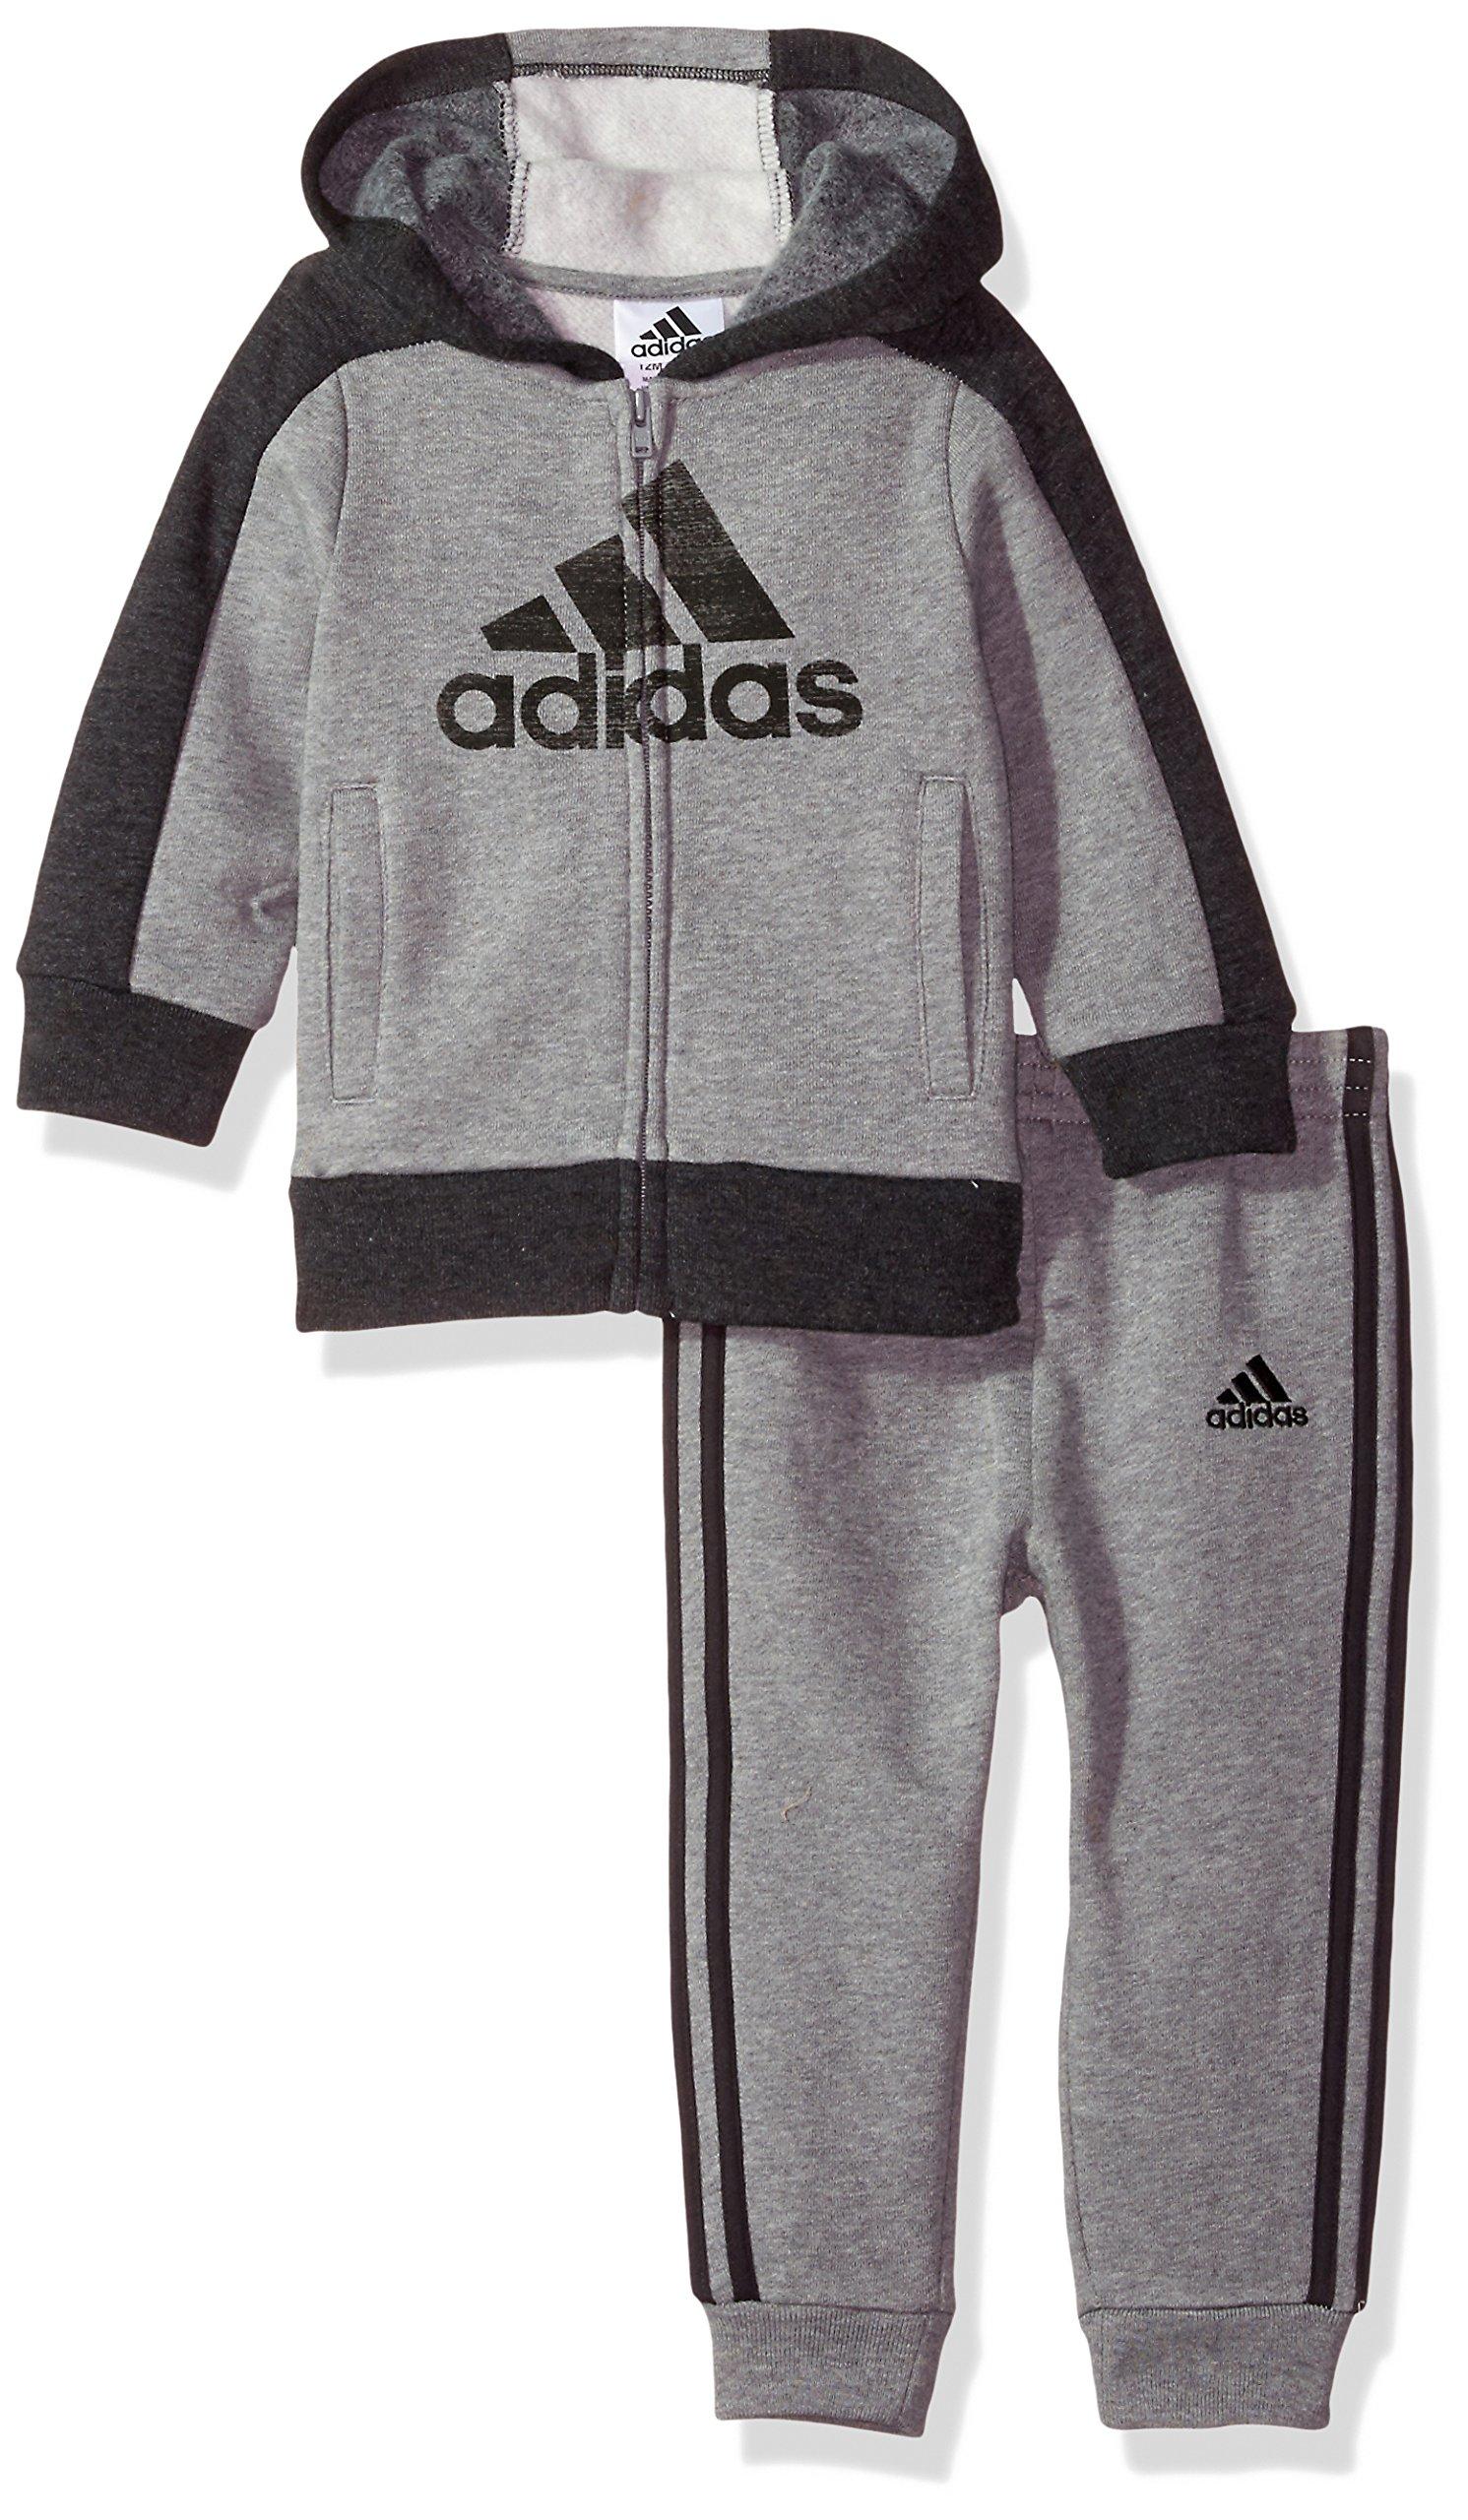 adidas Baby Boys Athletics Set, Dark Grey, 12M